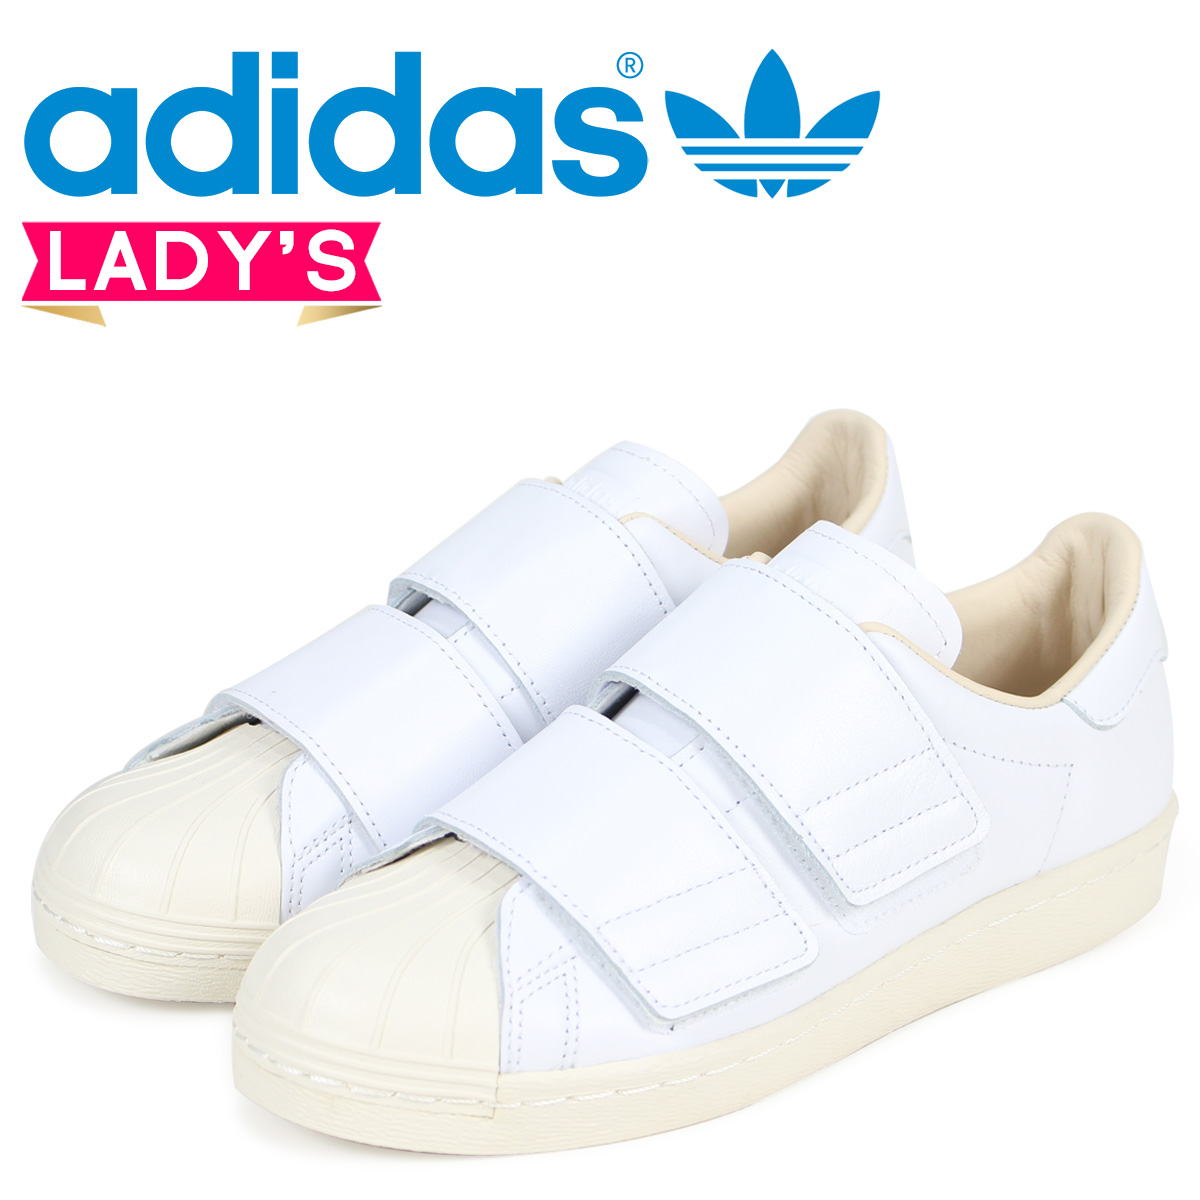 adidas Originals superstar 80s Adidas Lady'